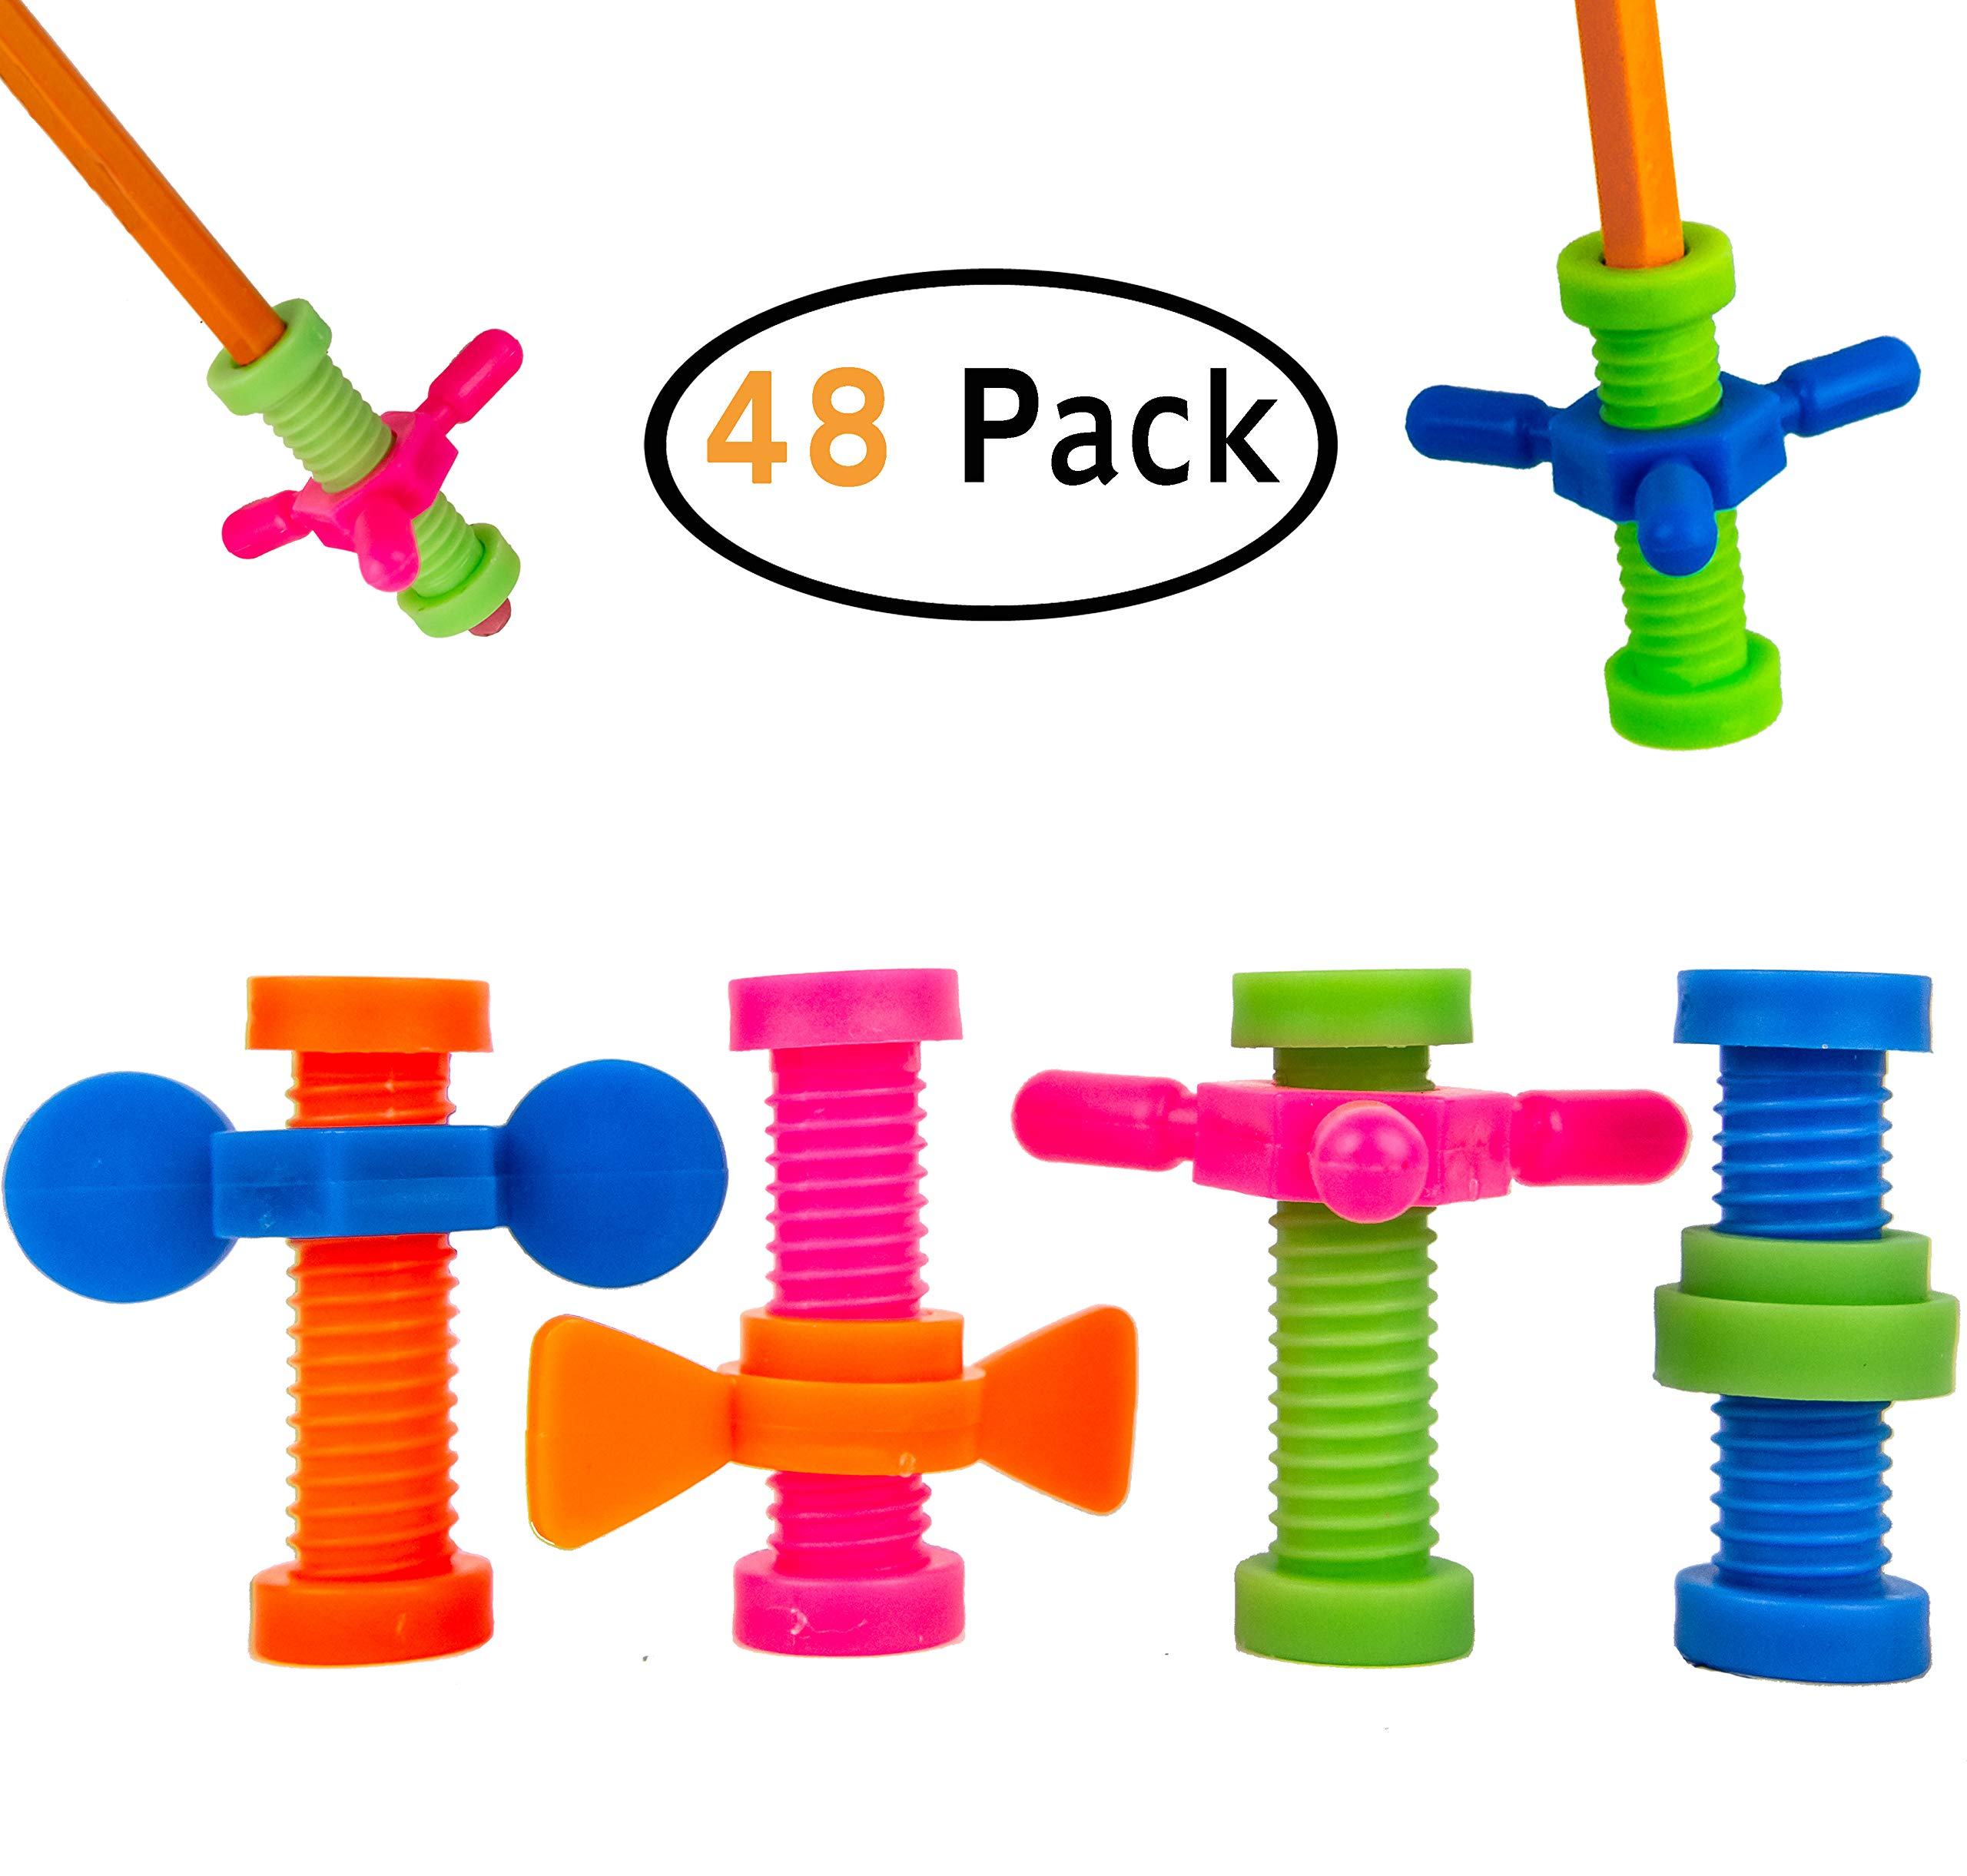 B-KIDS Pencil Fidget Toy Spinner Bulk (48 Pack) by B-KIDS (Image #1)